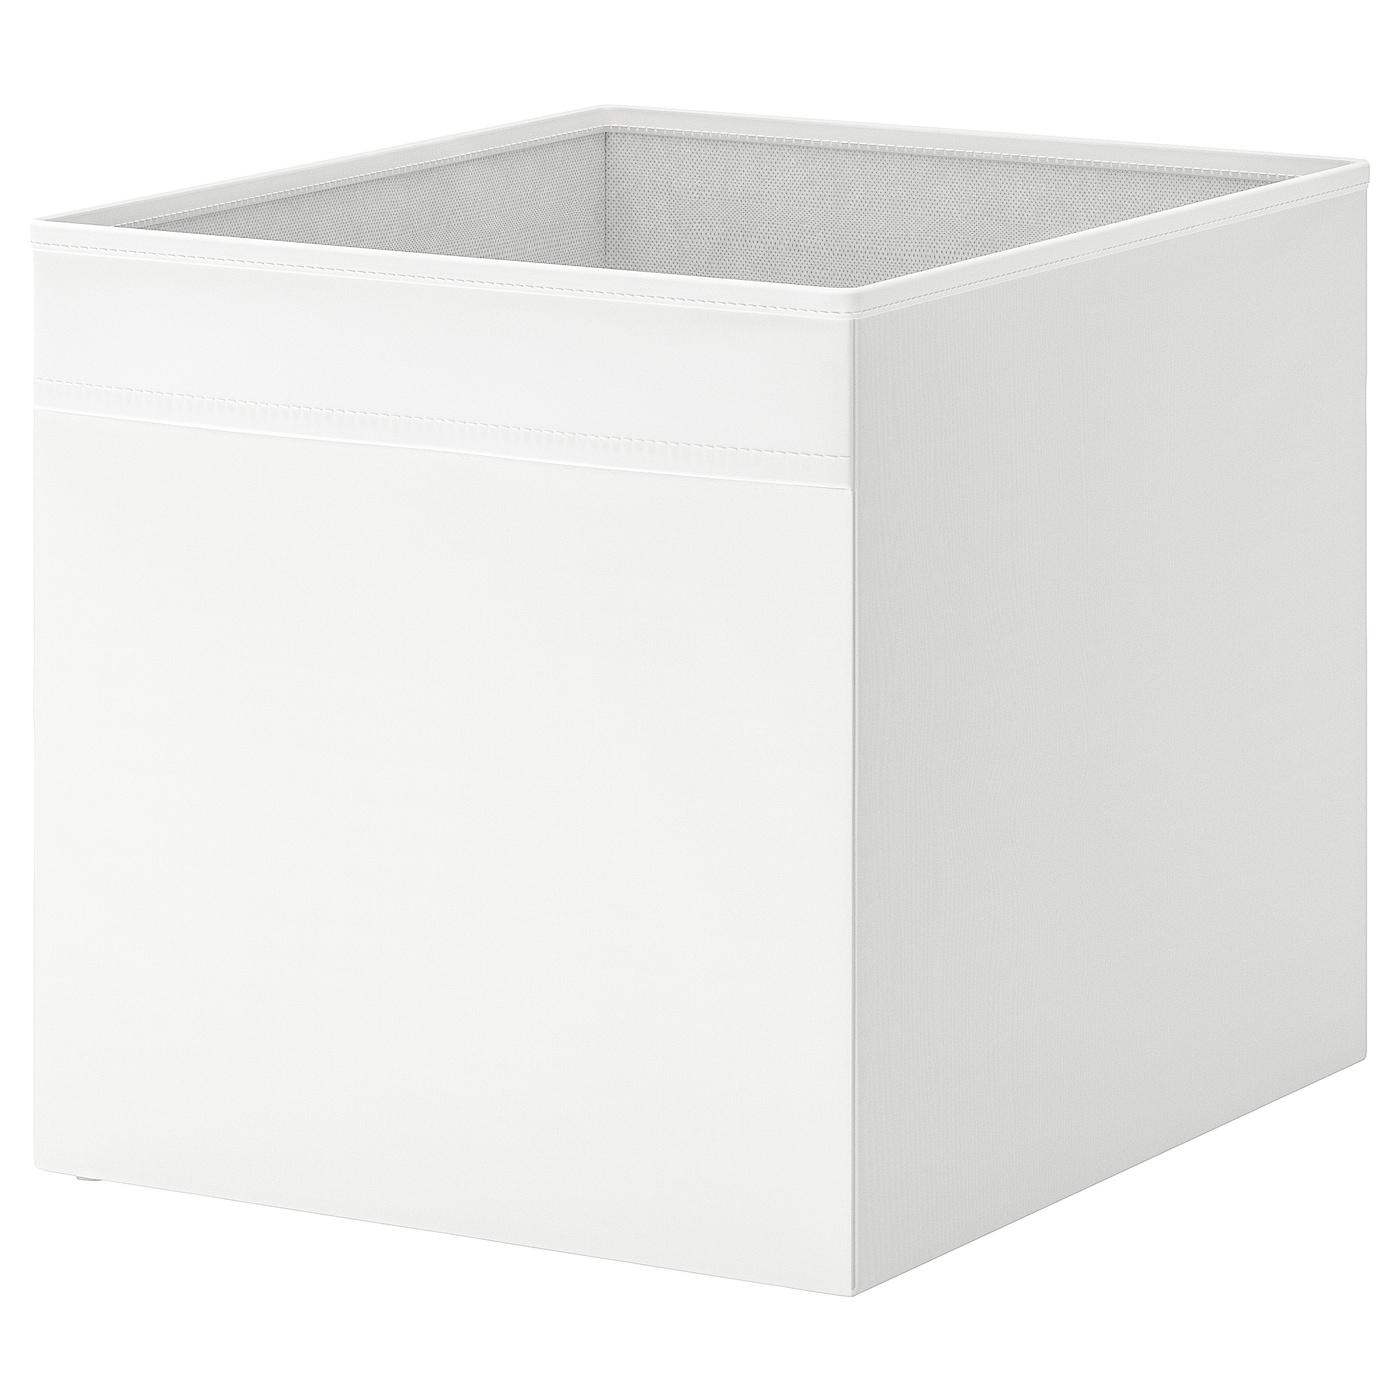 DRÖNA ドローナ ボックス